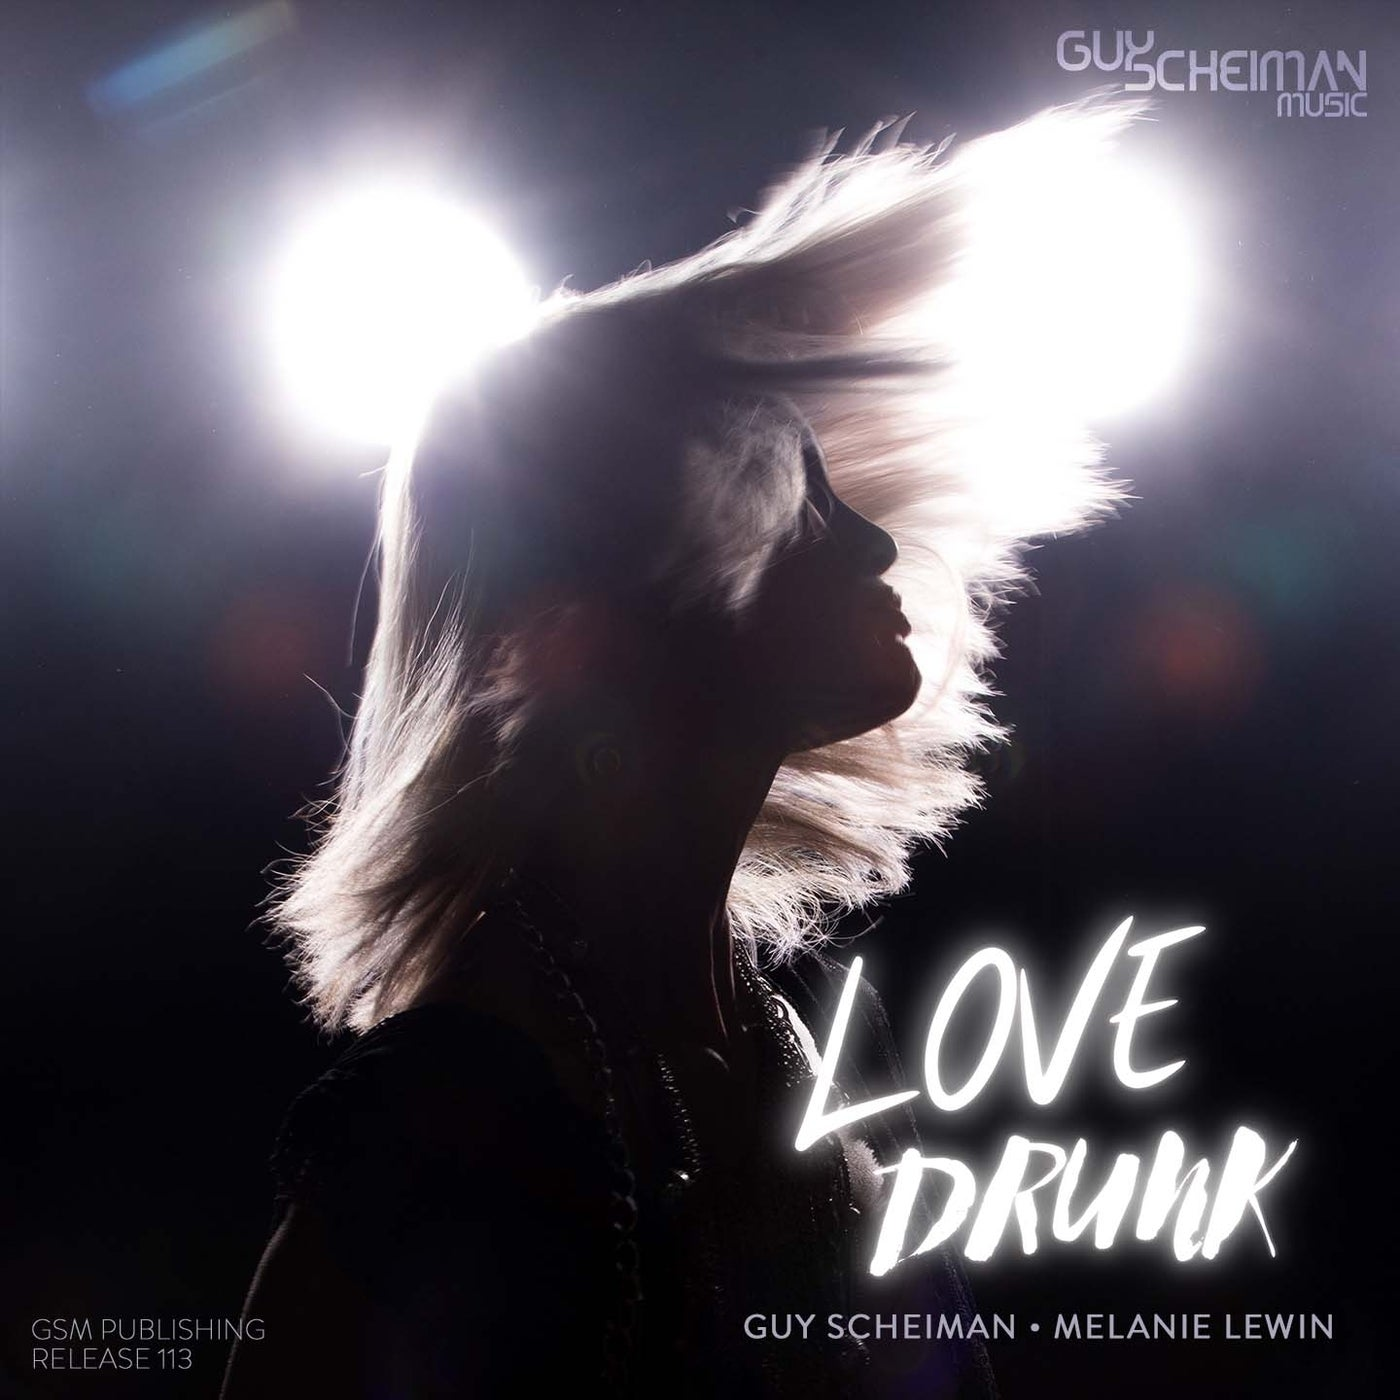 Love Drunk (Original Mix)